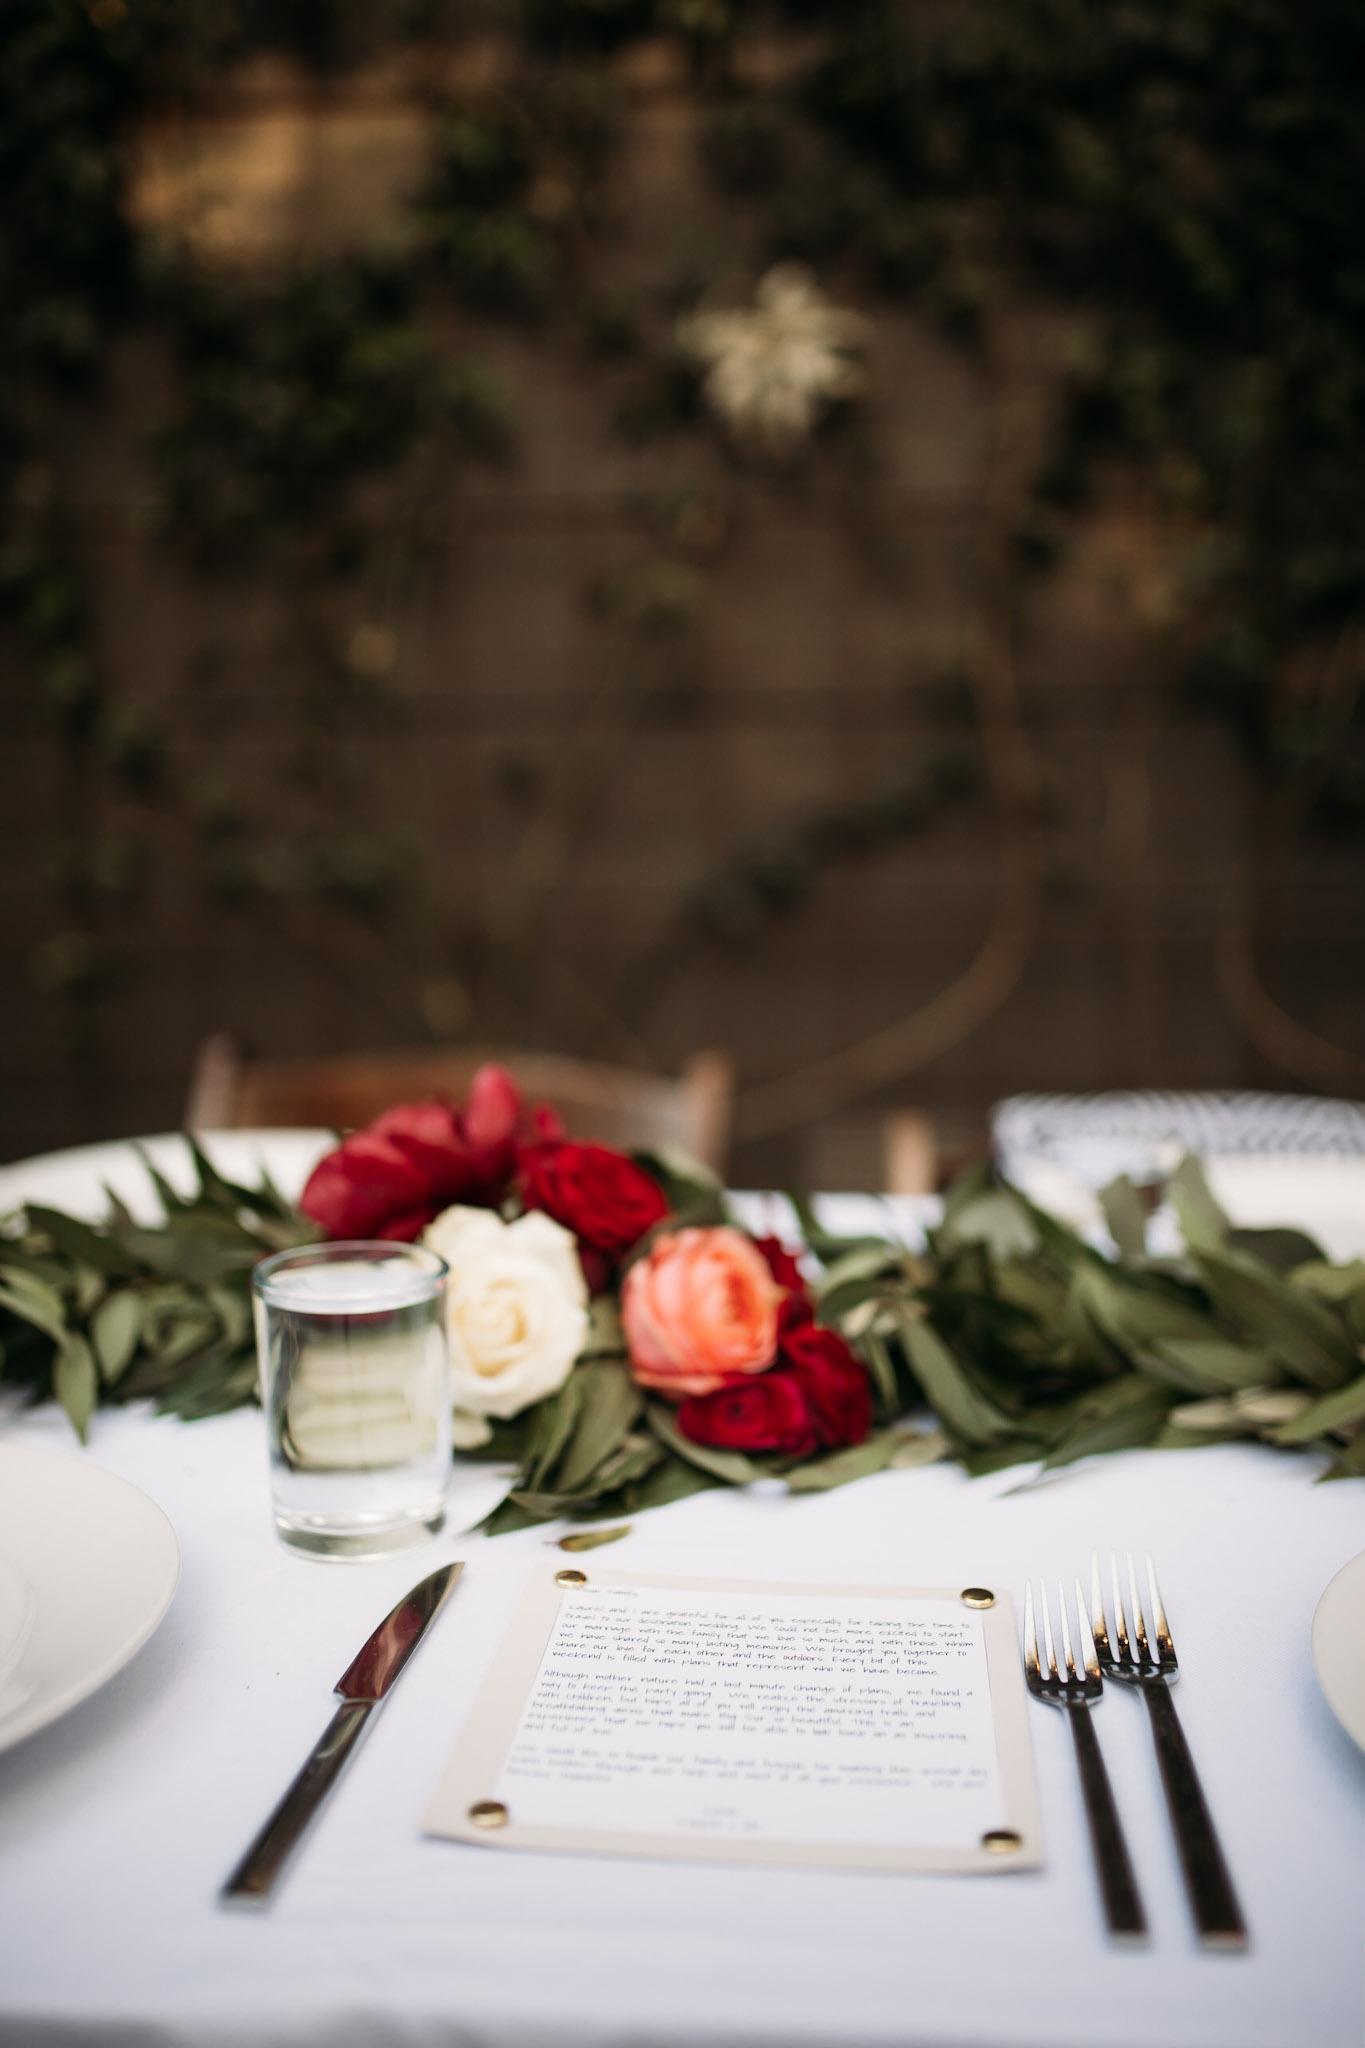 Laurel-Eli-Wedding-052617-A1DX3488.jpg